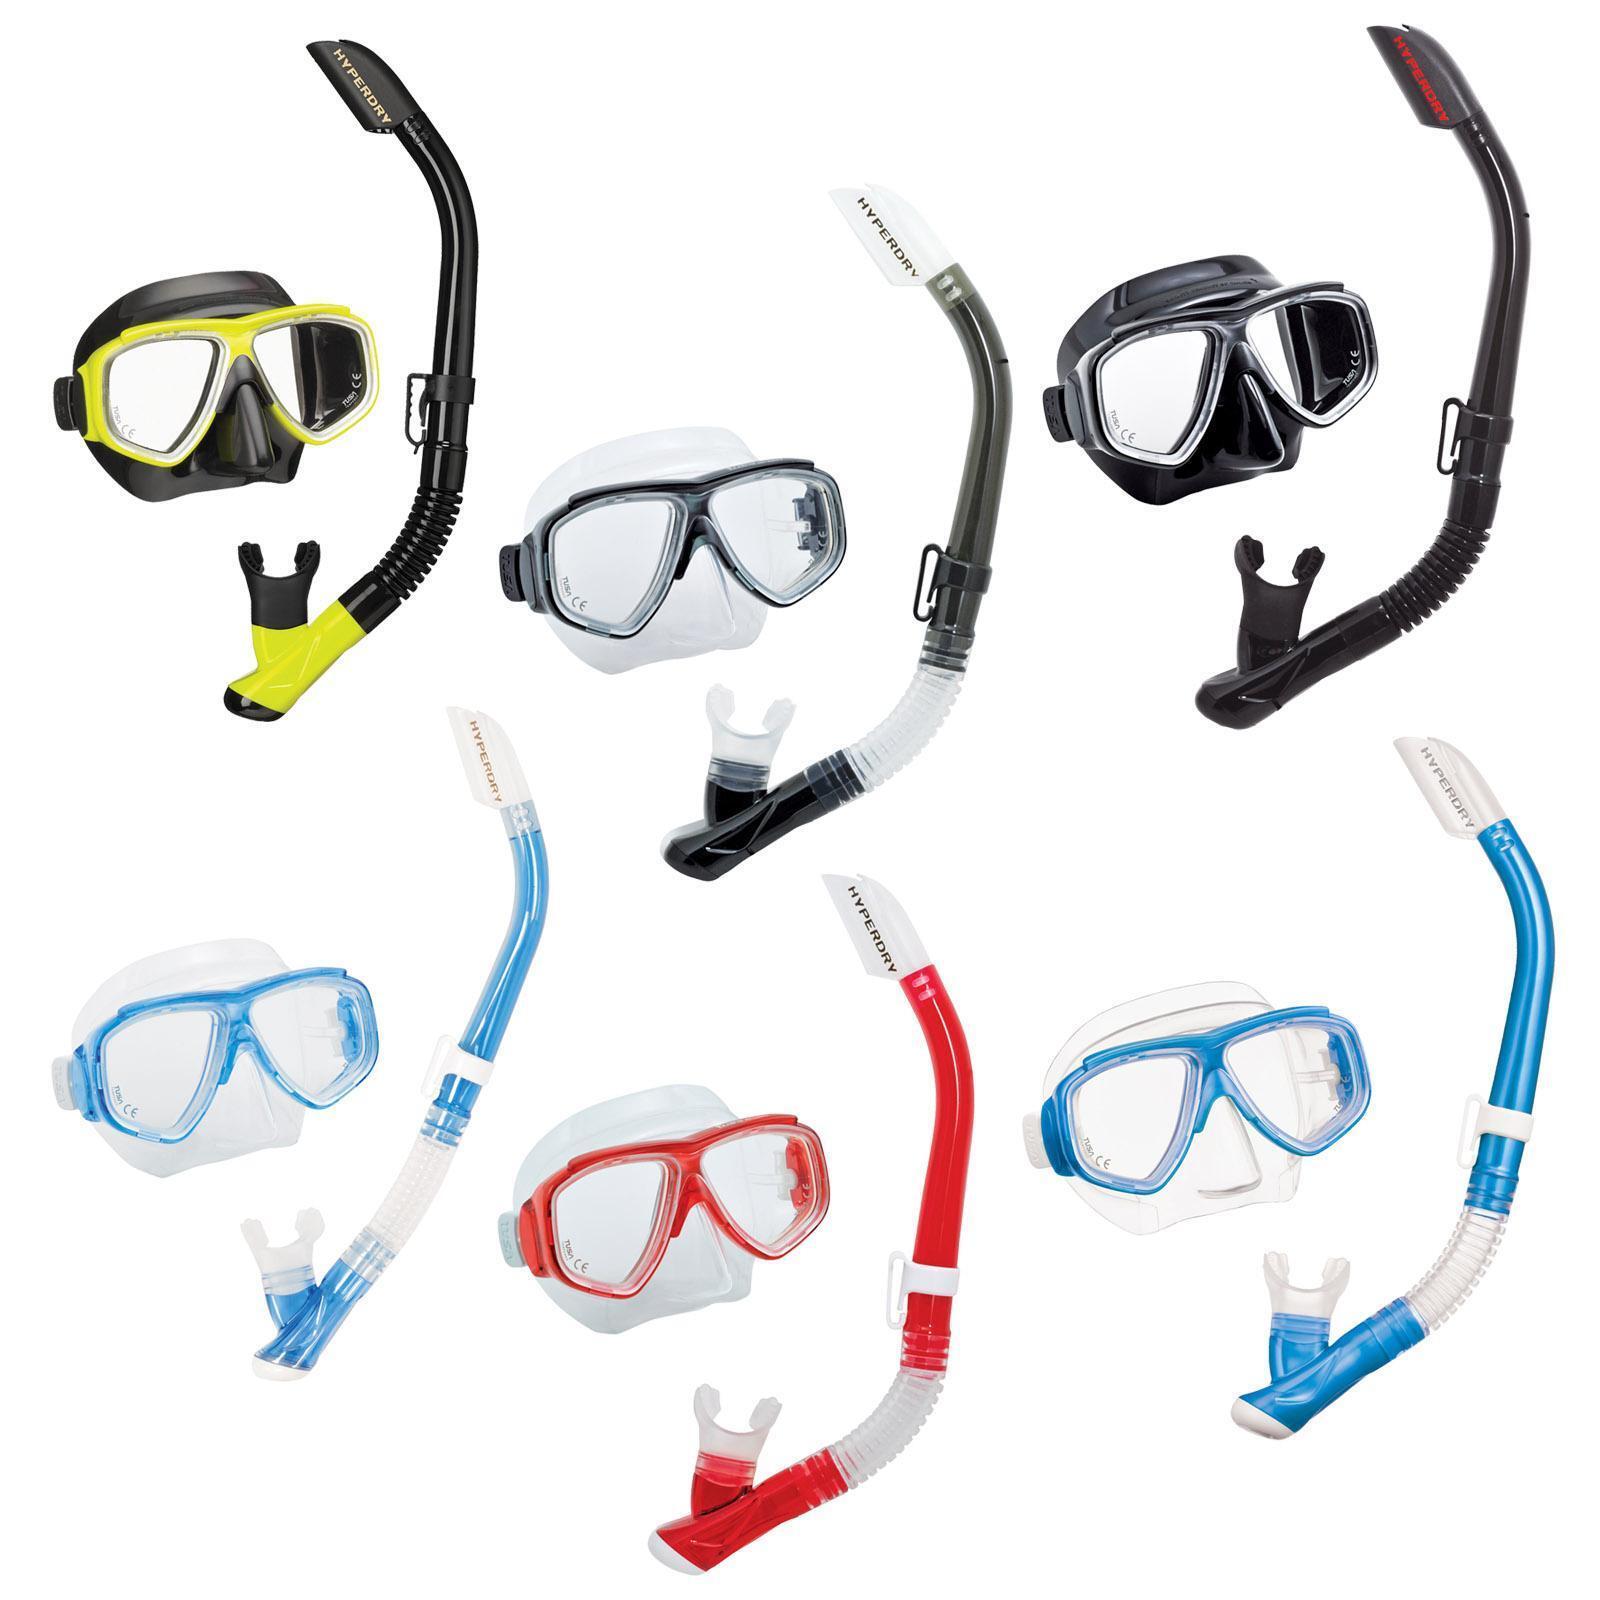 Tusa Snorkel Set - Splendive Combo for Adult